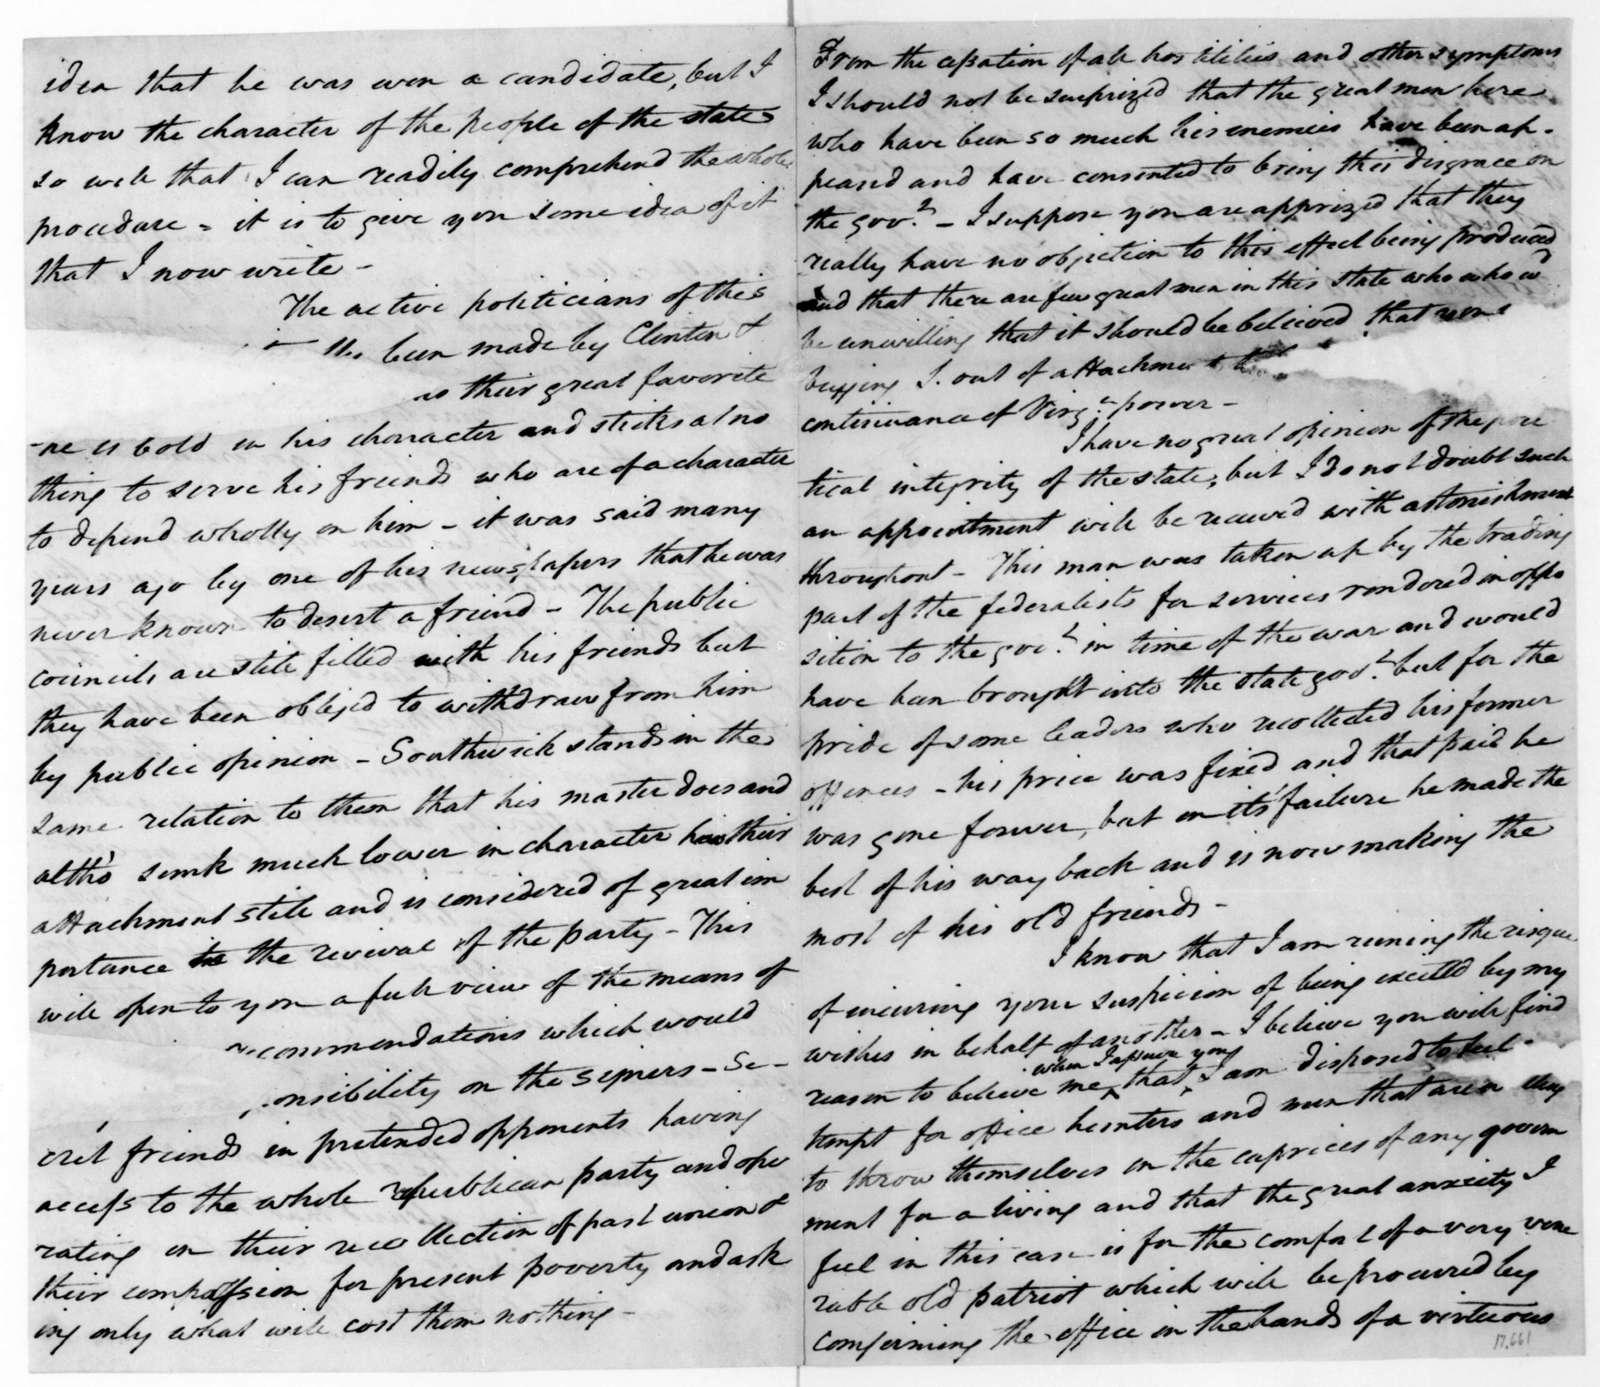 John Nicholas to James Madison, May 20, 1816.